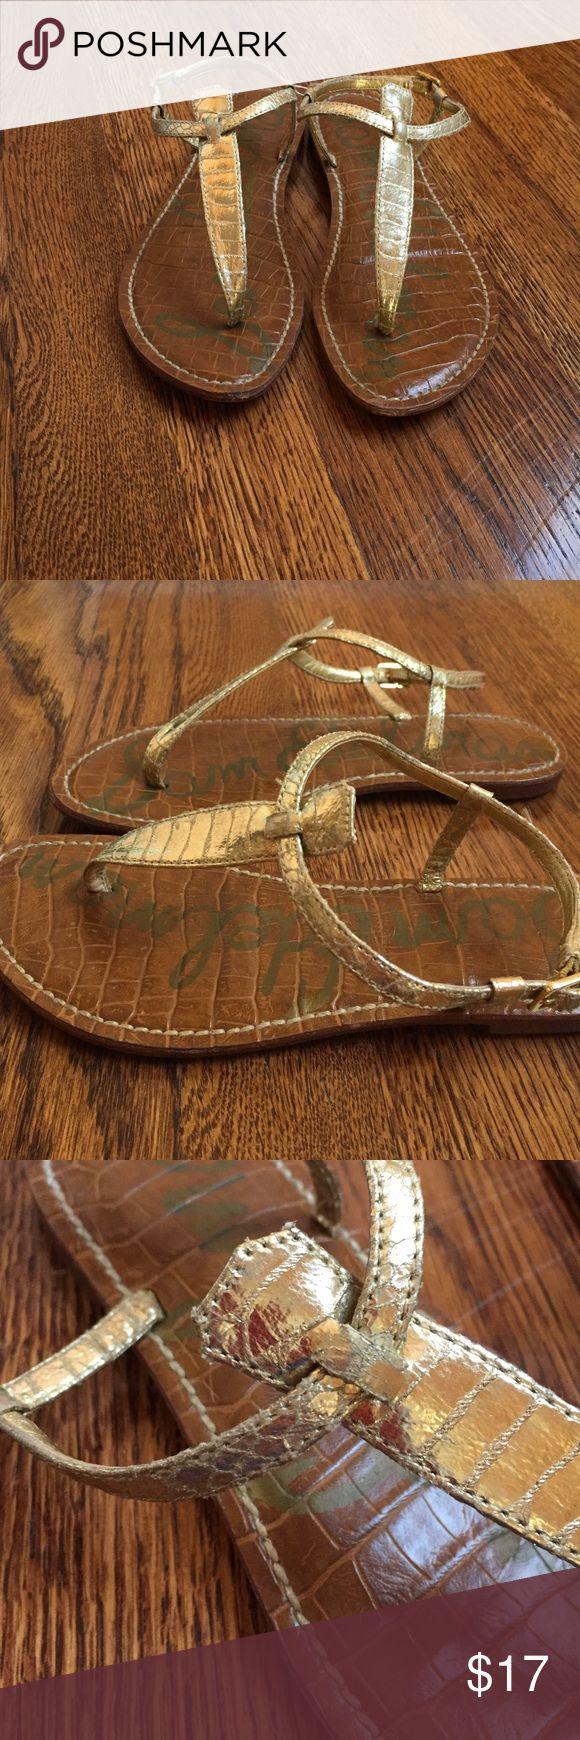 Gold Sam Edelman GiGi Sandals Fun gold Sandals. These do have some wear but still in pretty shape😜 Sam Edelman Shoes Sandals